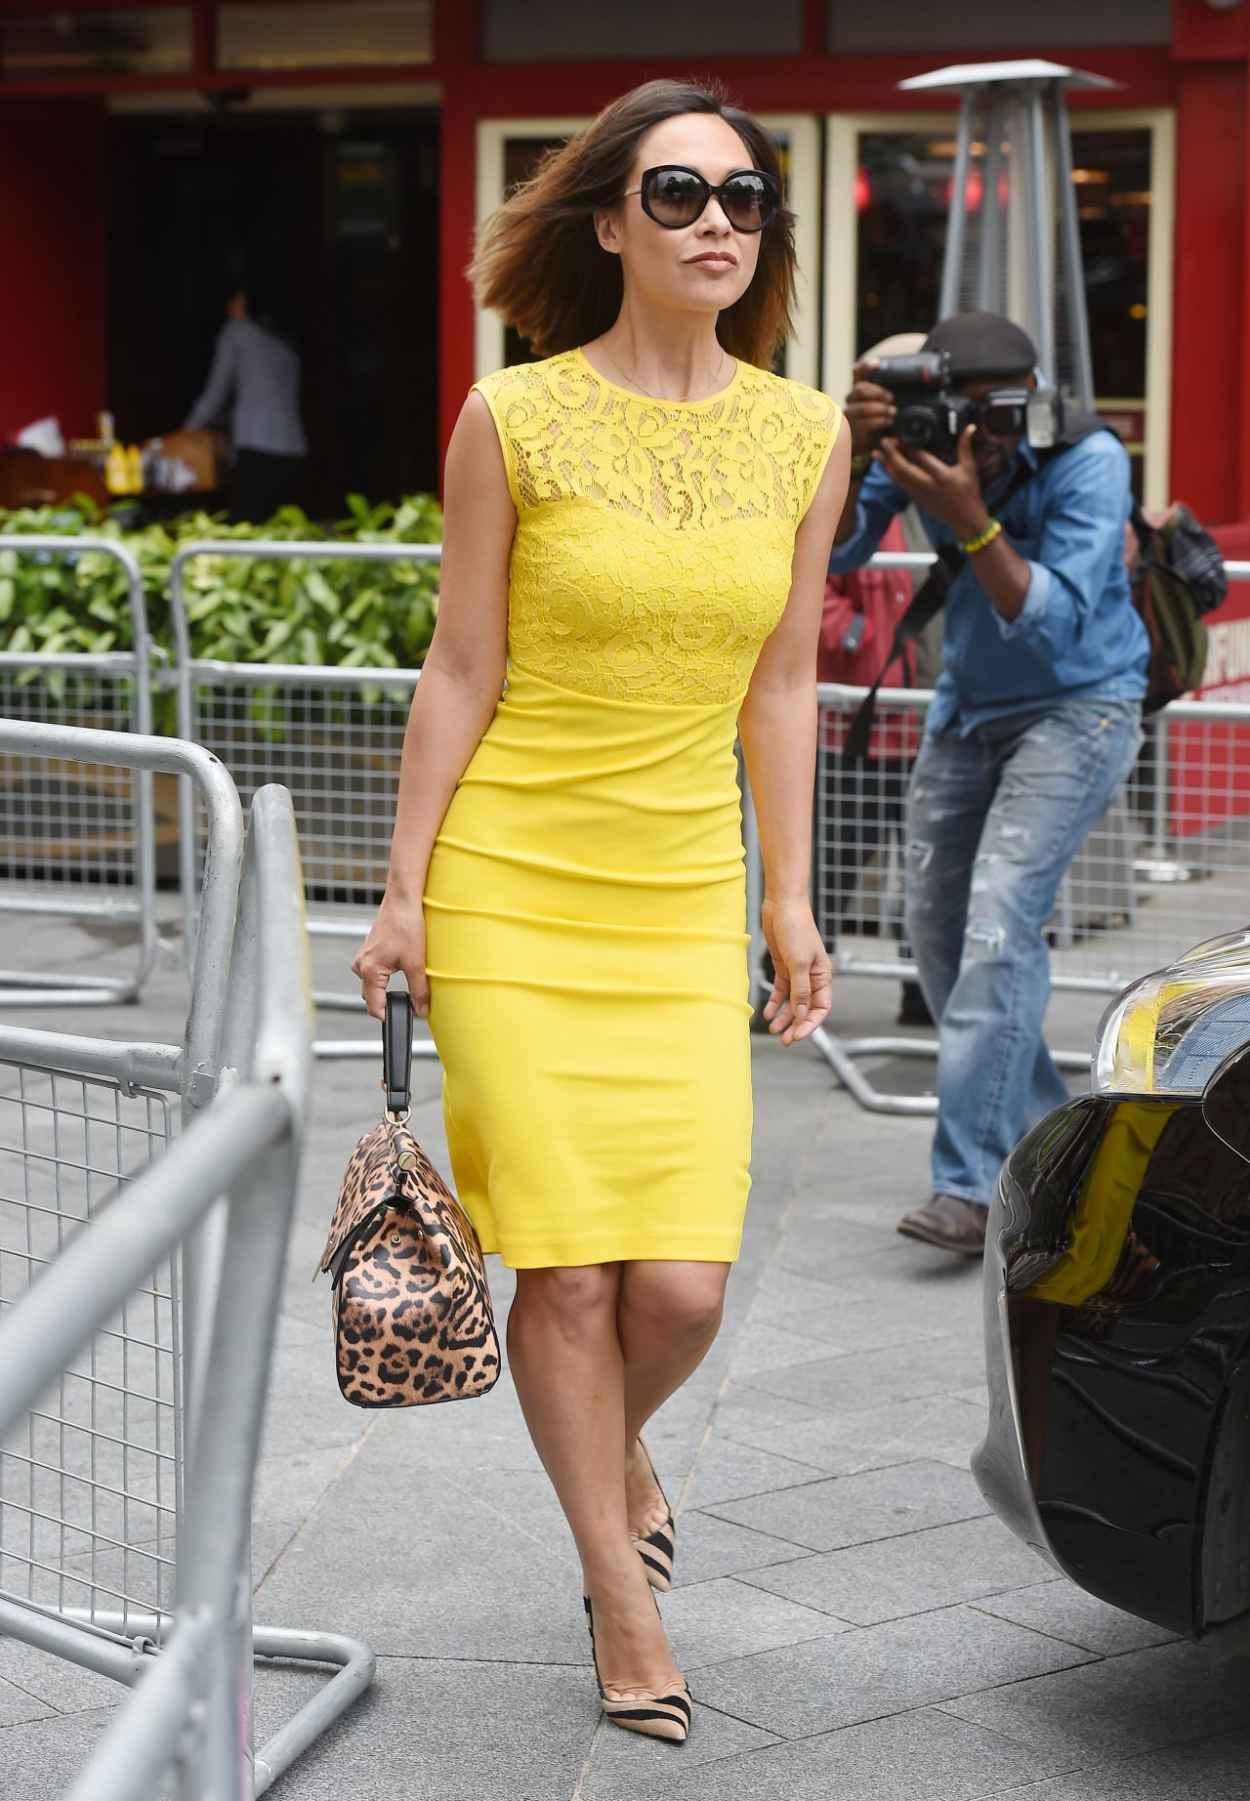 Myleene Klass Style - Arrives at Global Radio in London, July 2015-4